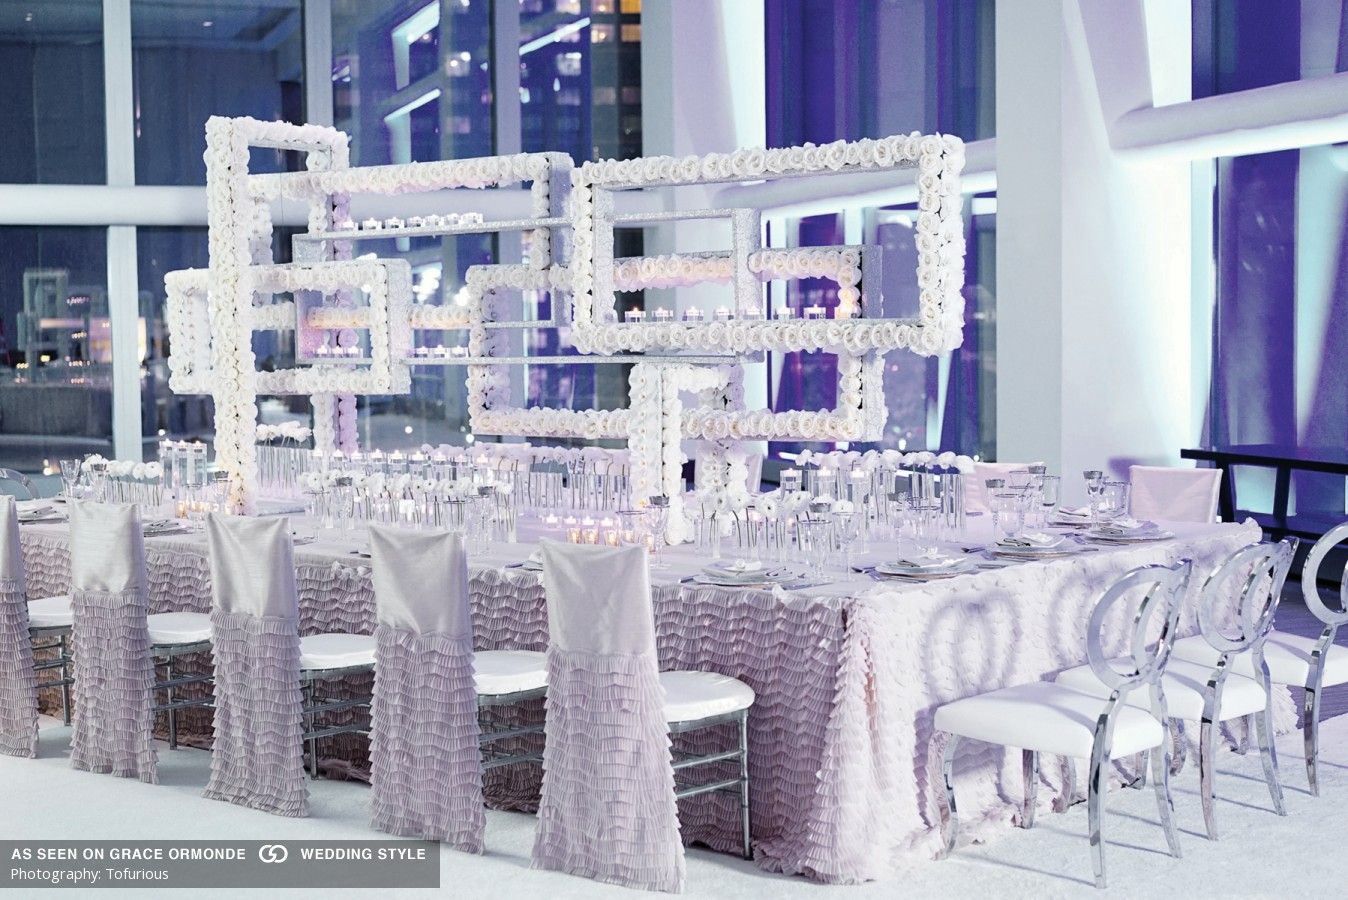 Modern wedding decor images  romantic modern wedding reception tabletop decor  Modern Wedding